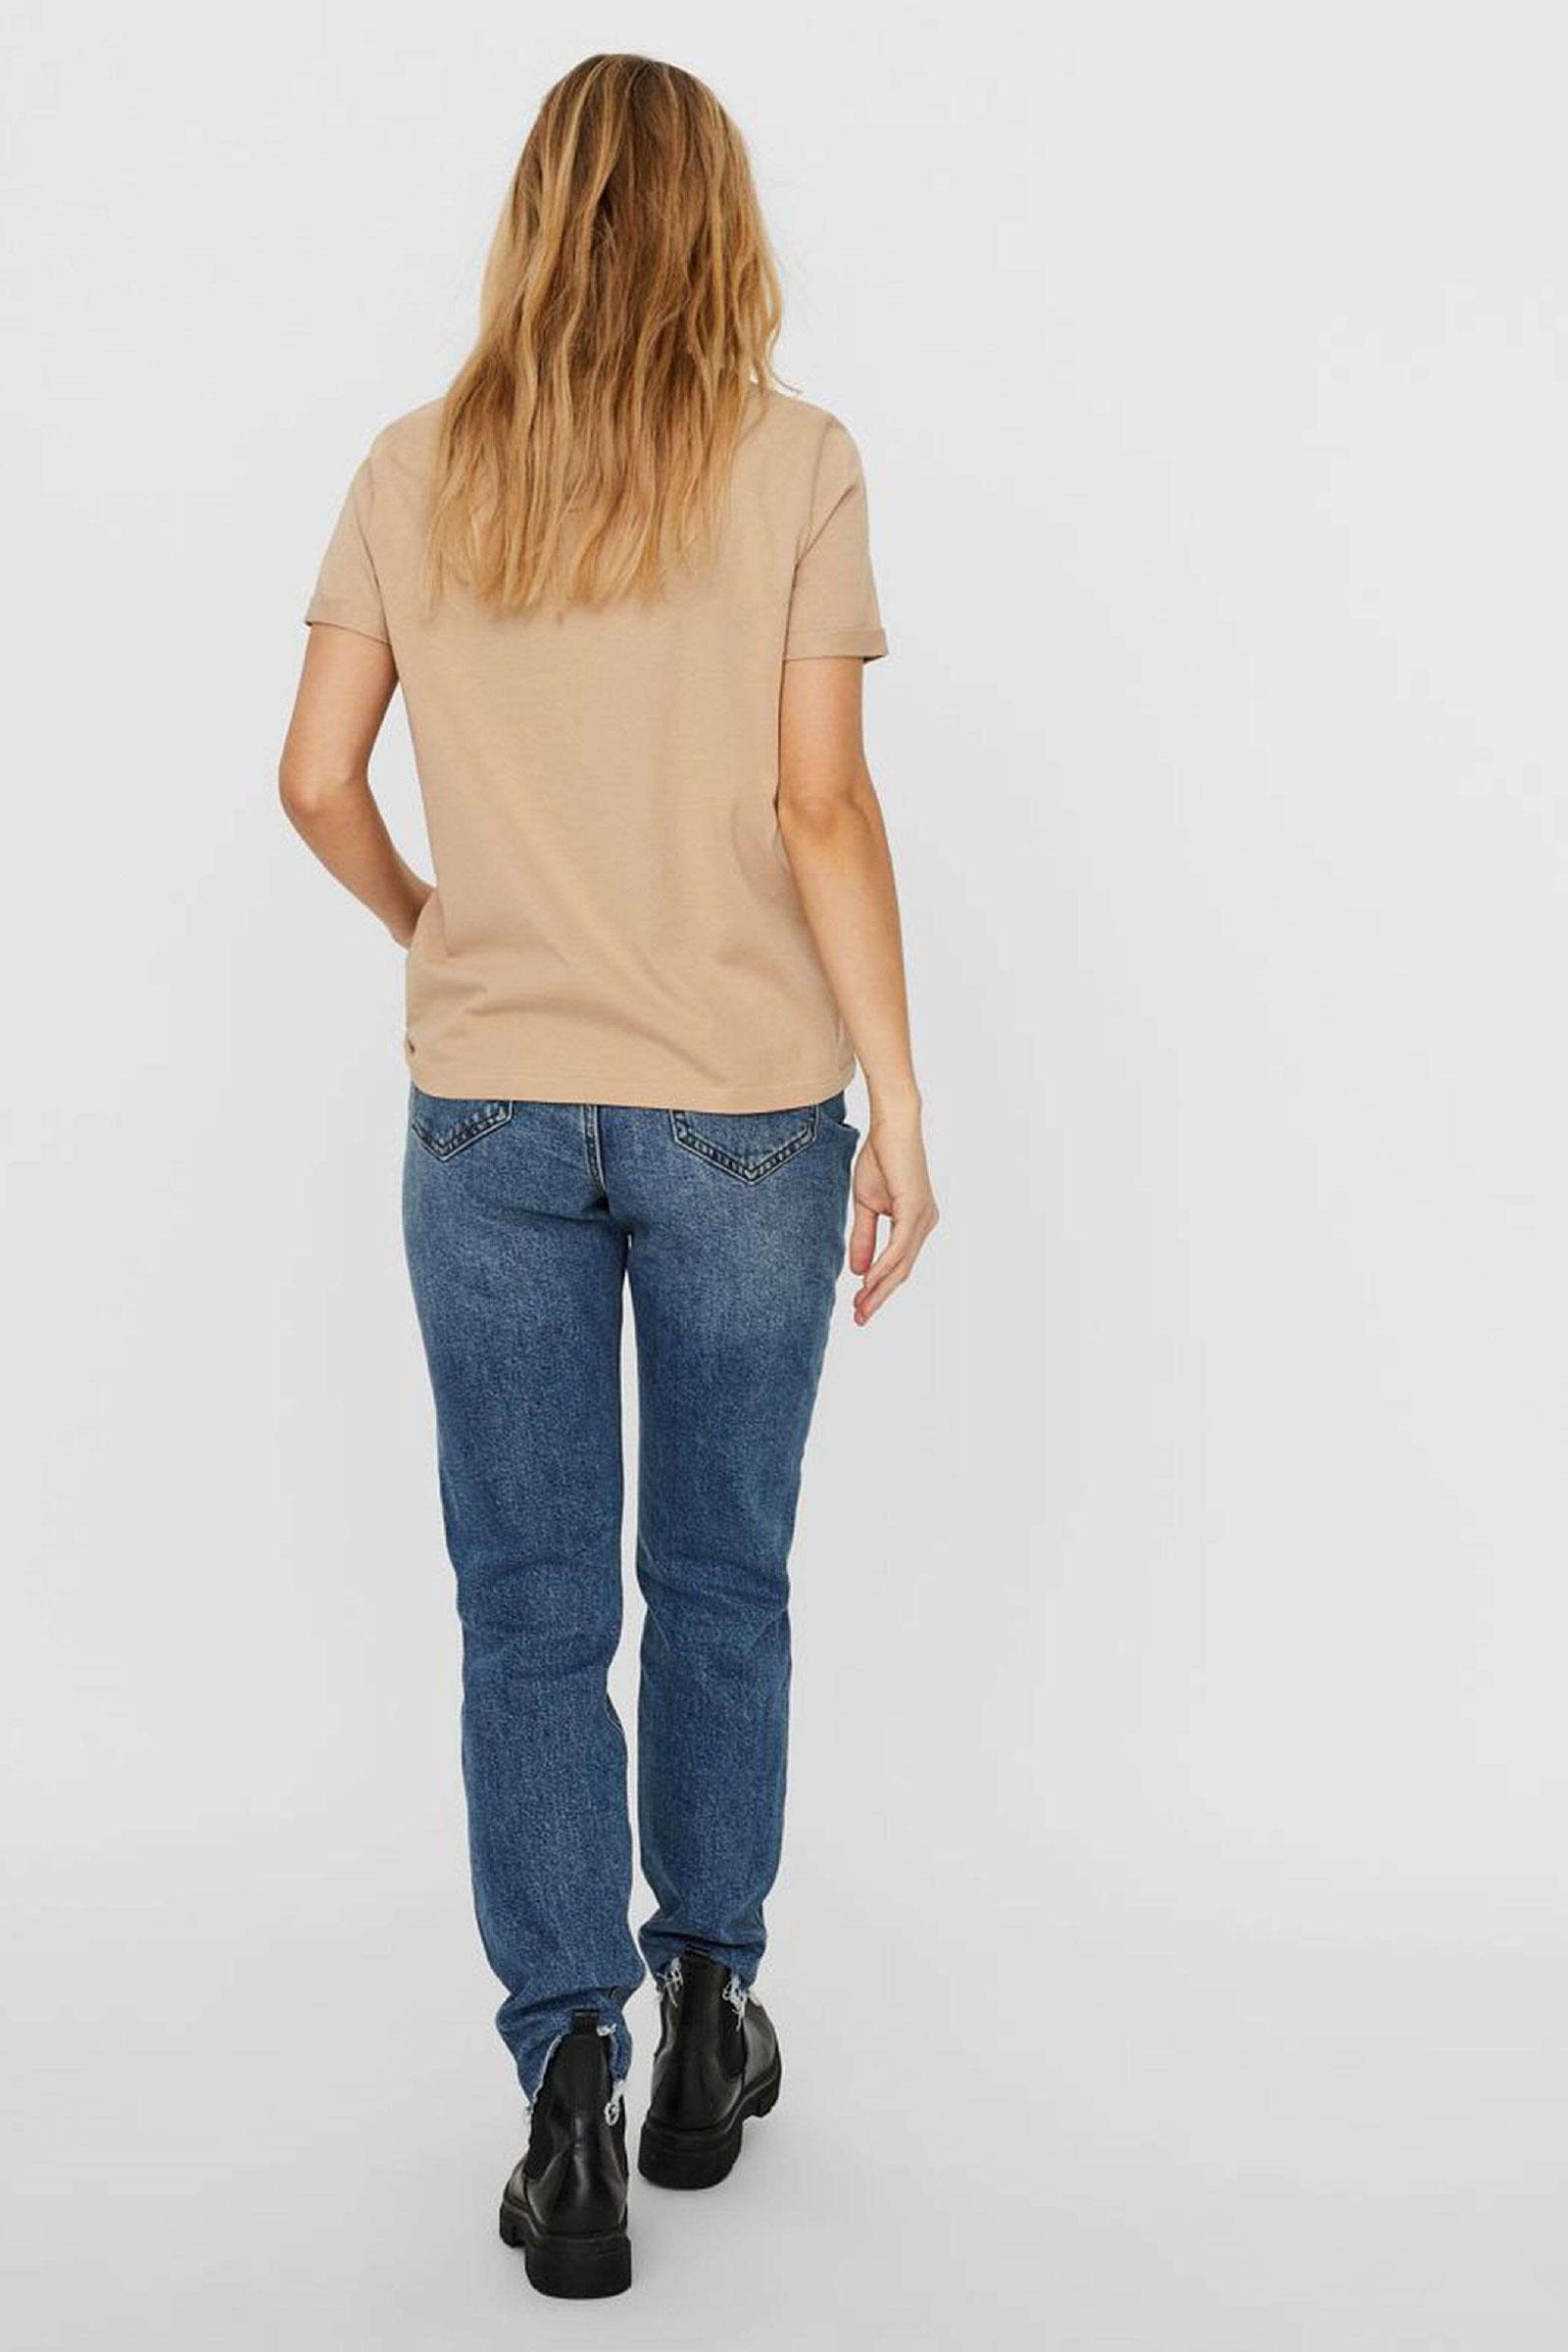 VERO MODA Women's T-Shirt VERO MODA | T-Shirt | 10243890Nomad